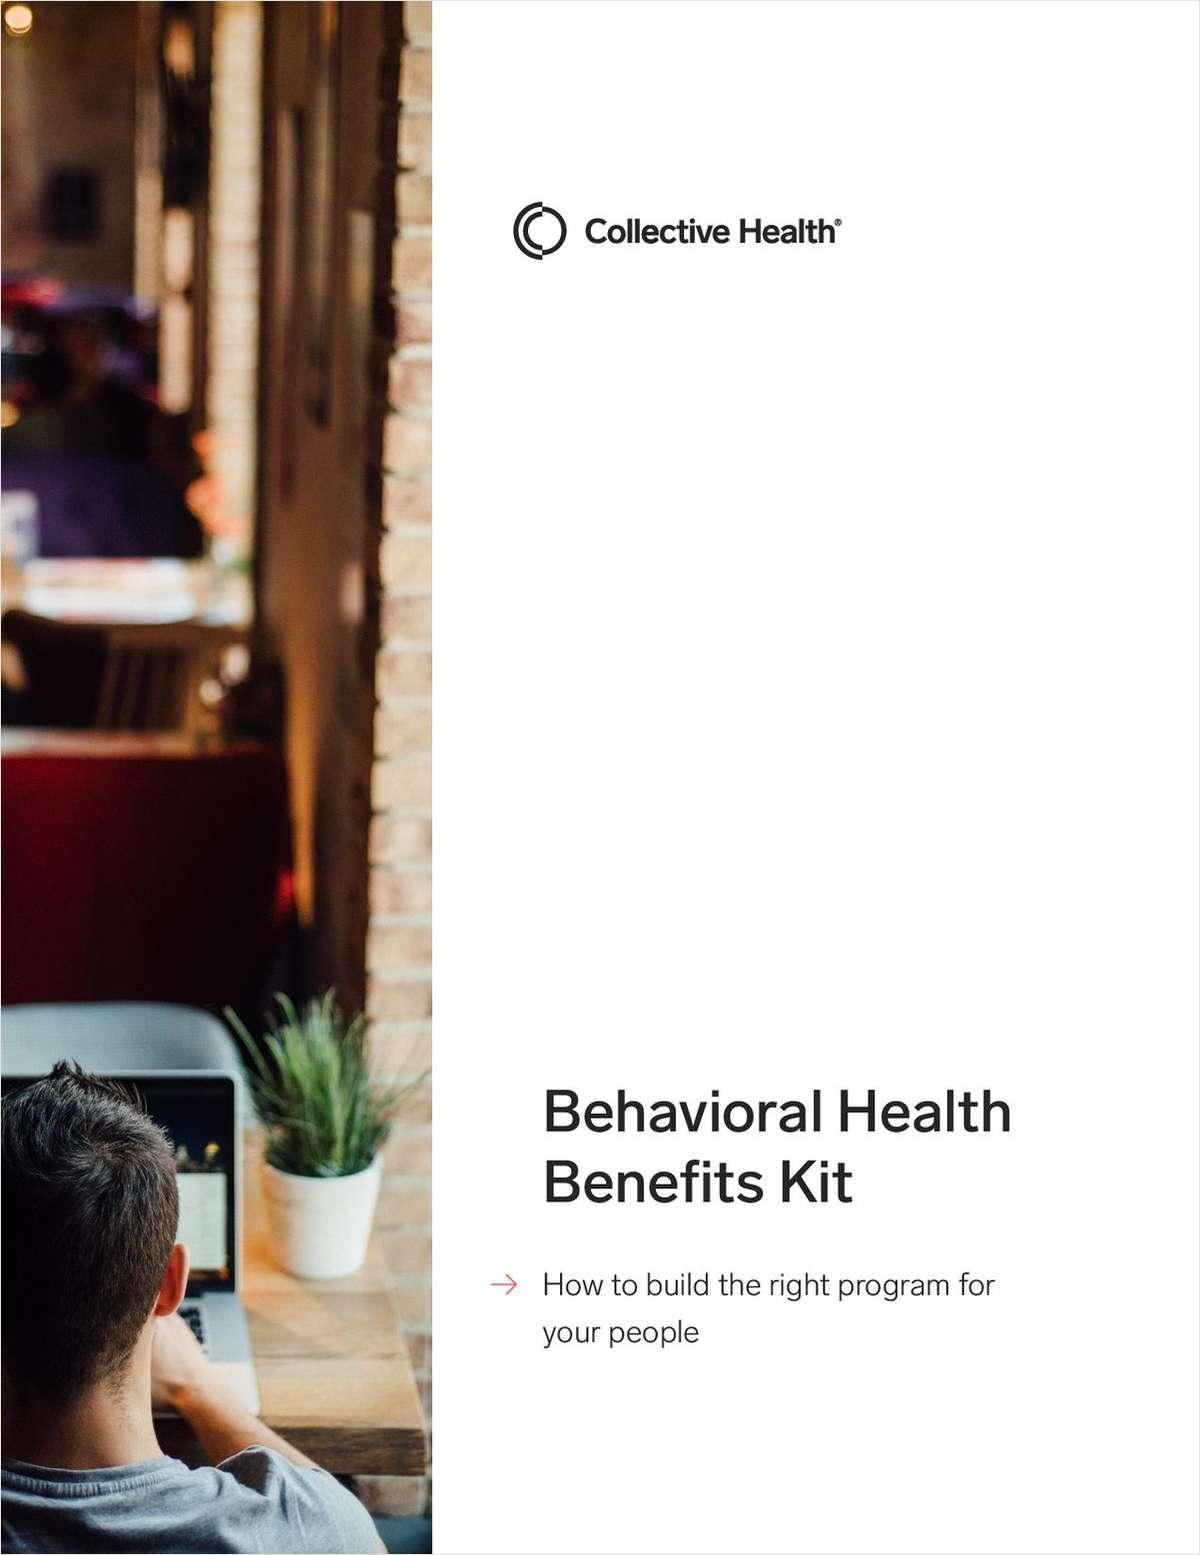 Behavioral Health Benefits Kit